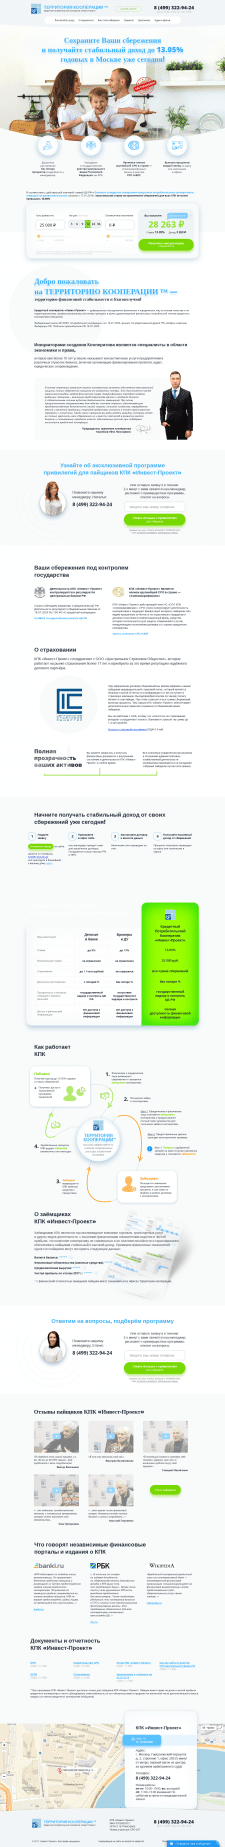 "Сайт-визитка КПК ""Инвест-Проект"", г.Москва"